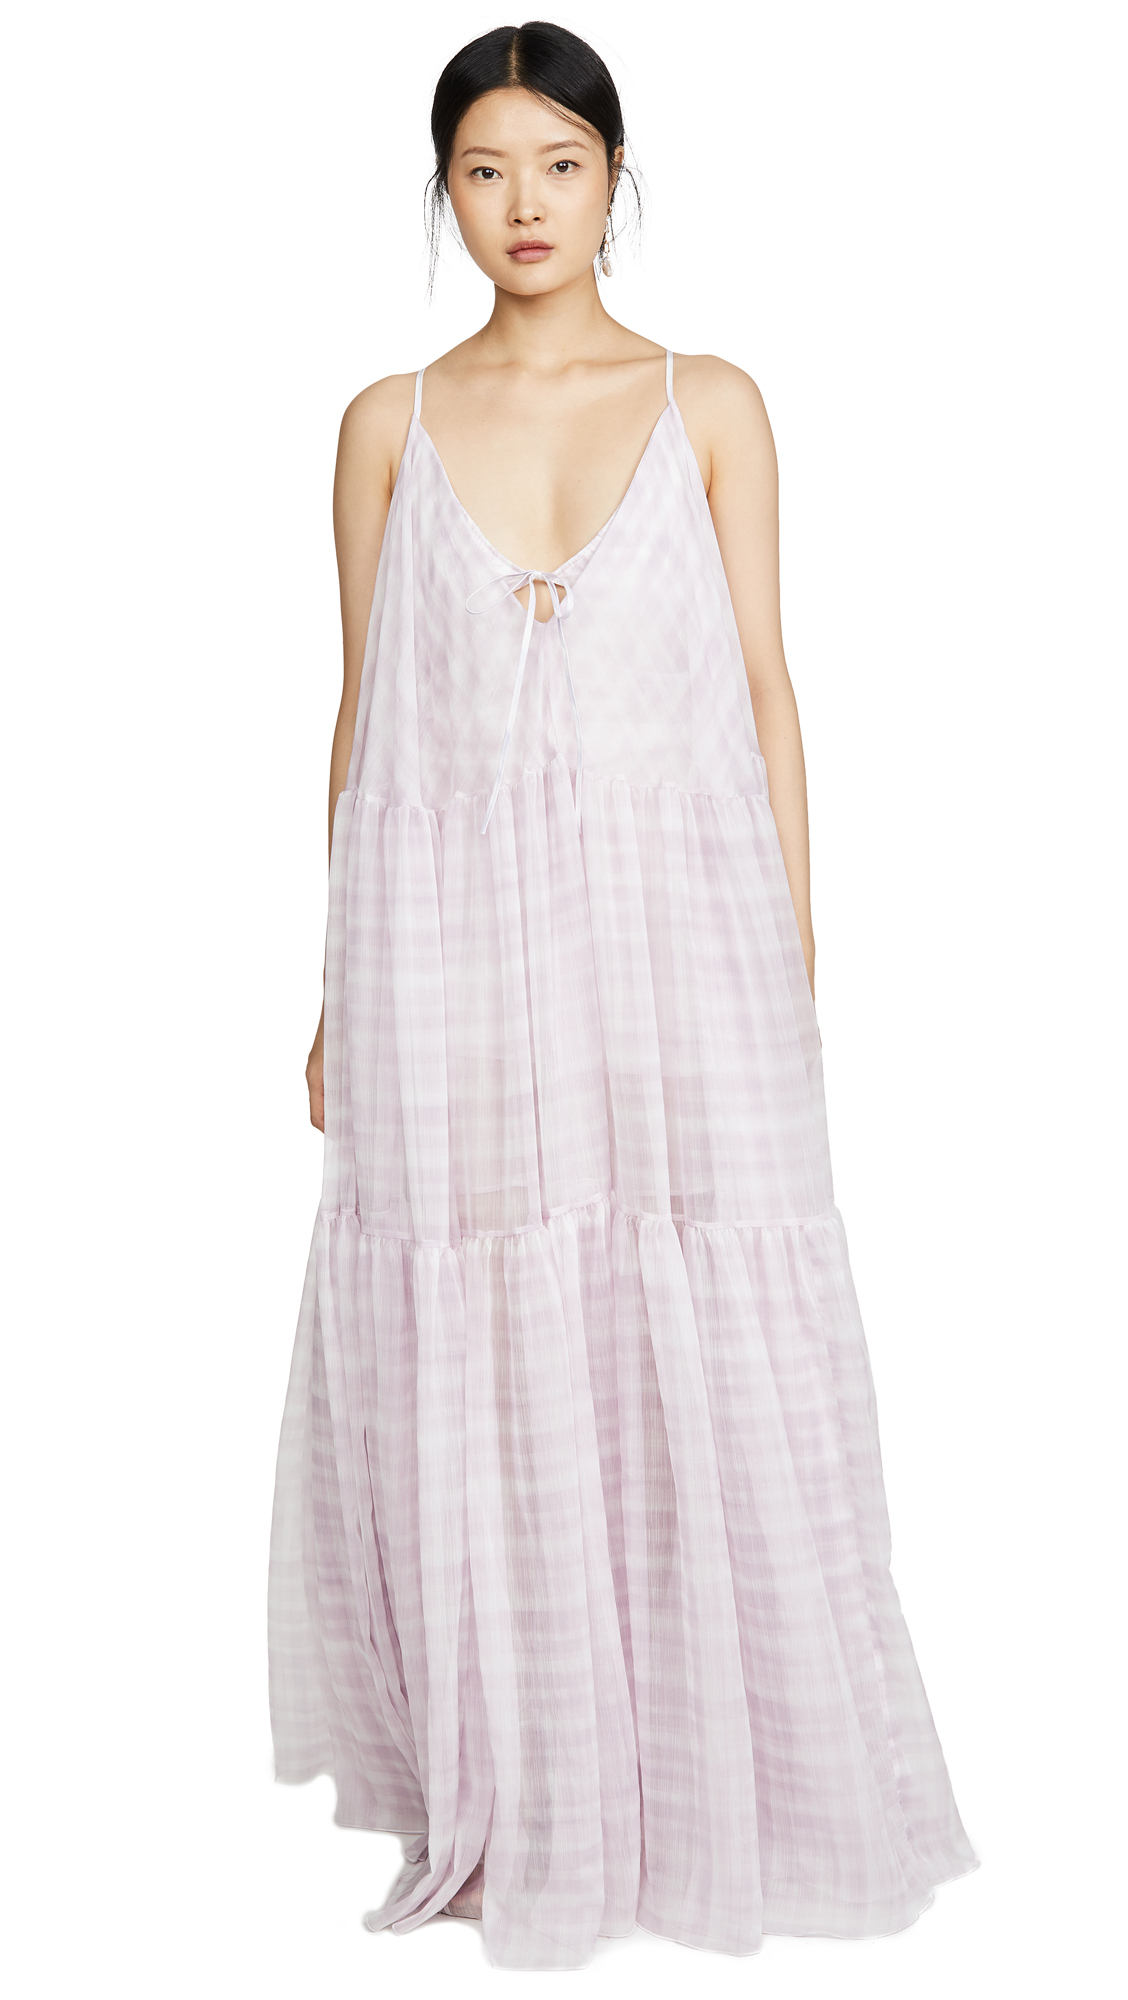 Jacquemus The Mistral Dress - 50% Off Sale